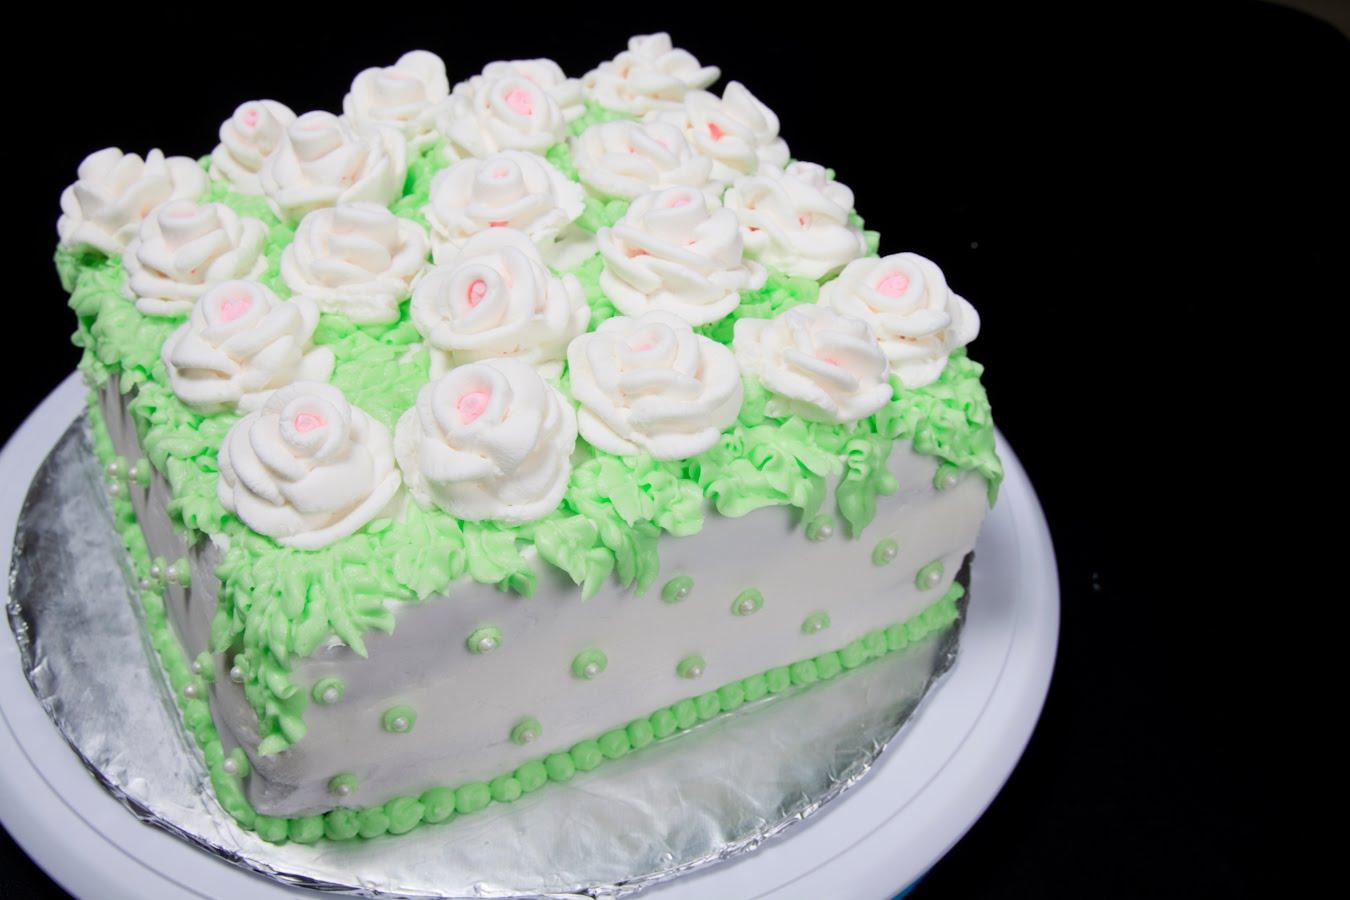 Cakestraordinary Happy birthday to my mom